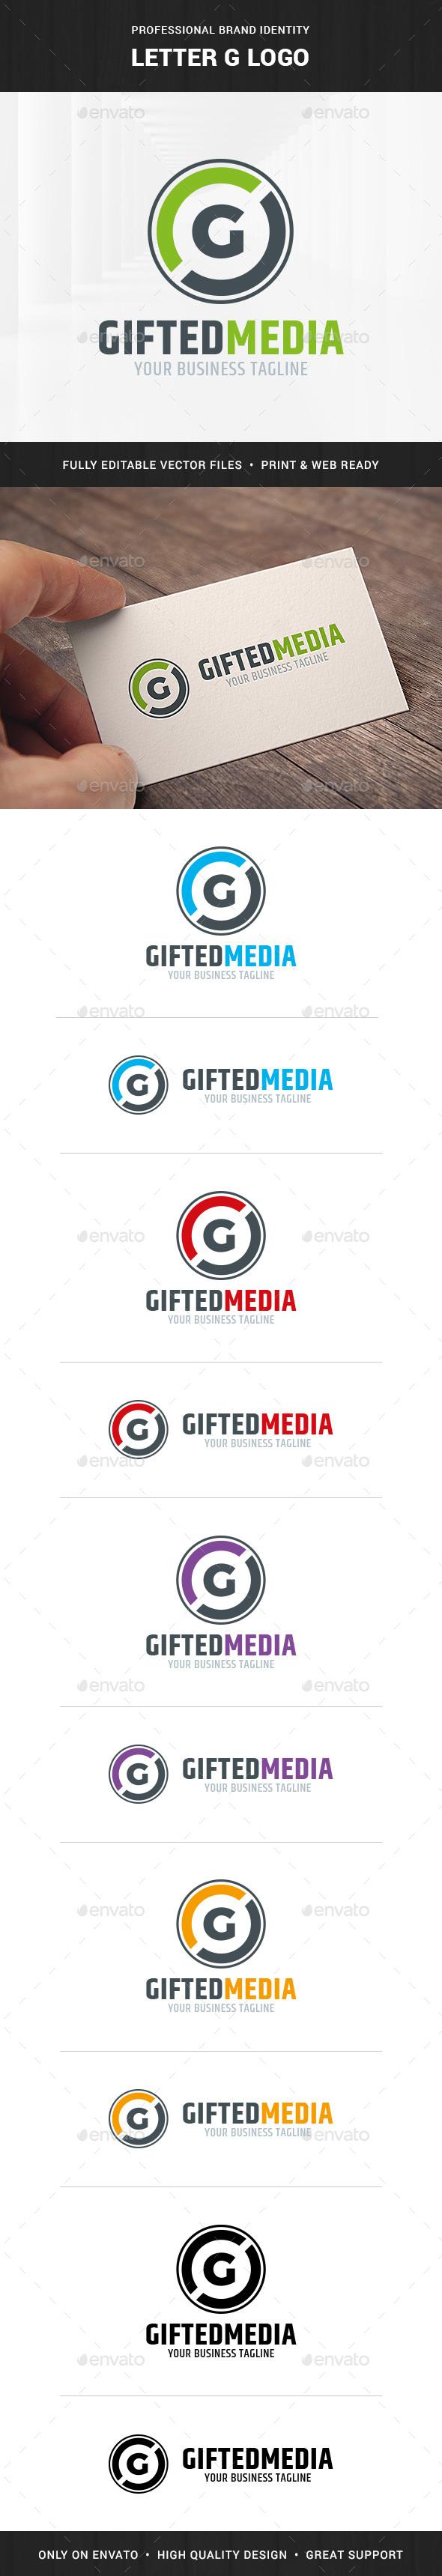 Letter G Logo Template - Letters Logo Templates